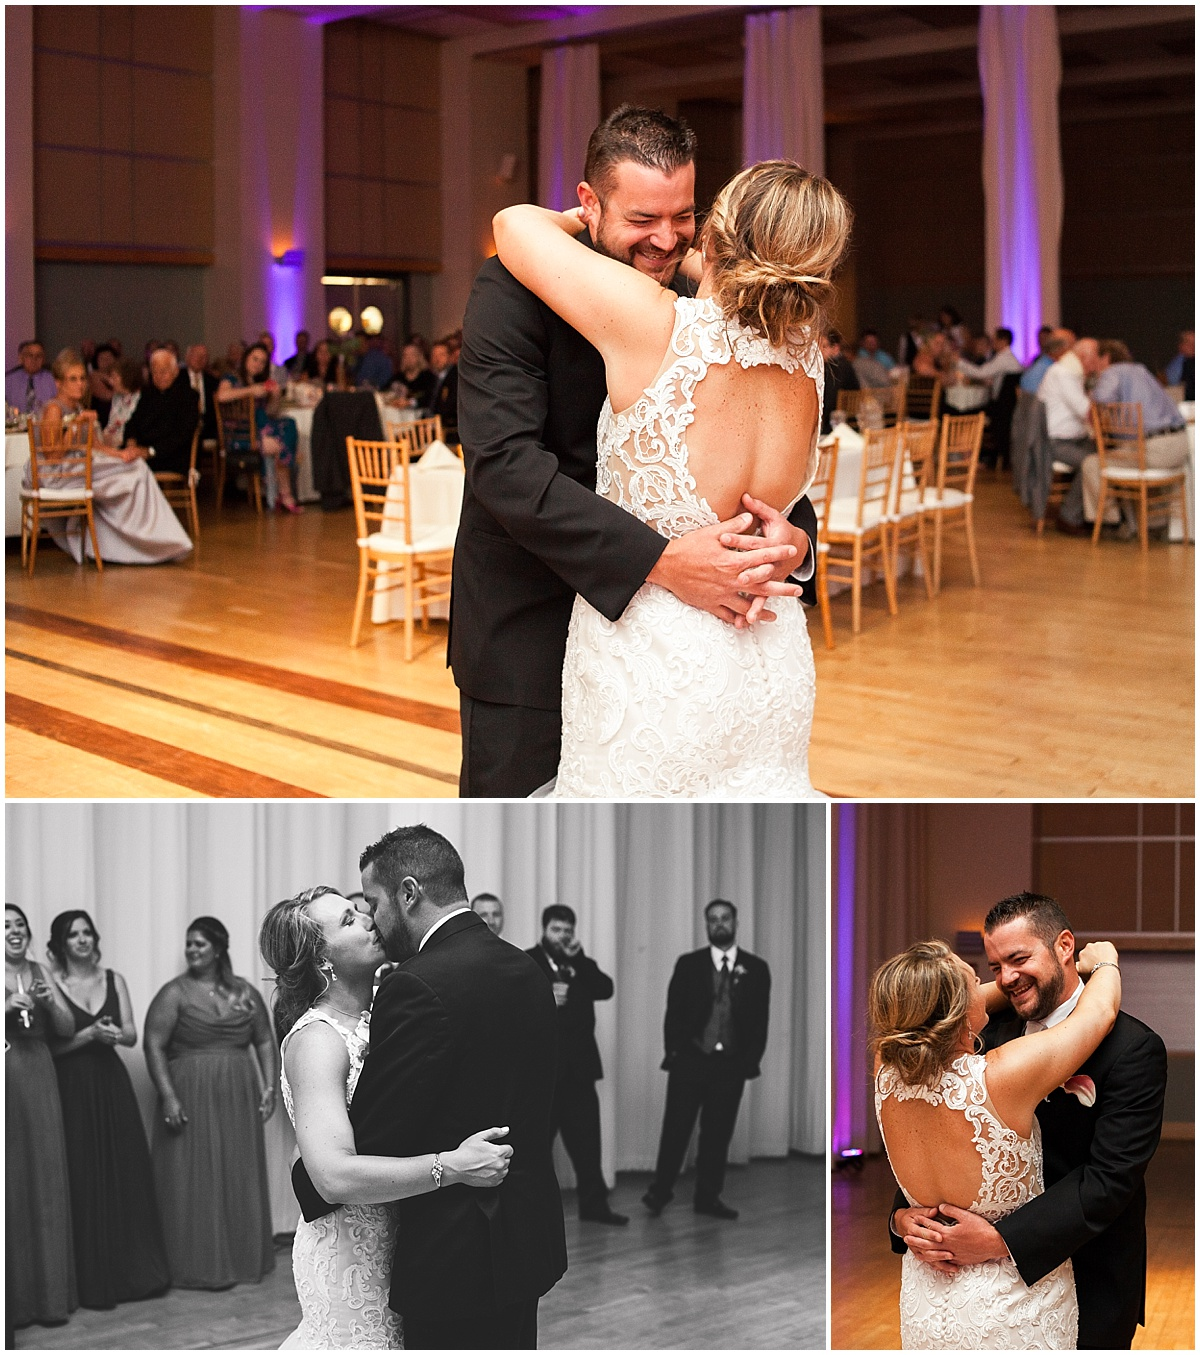 wedding reception dancing couple